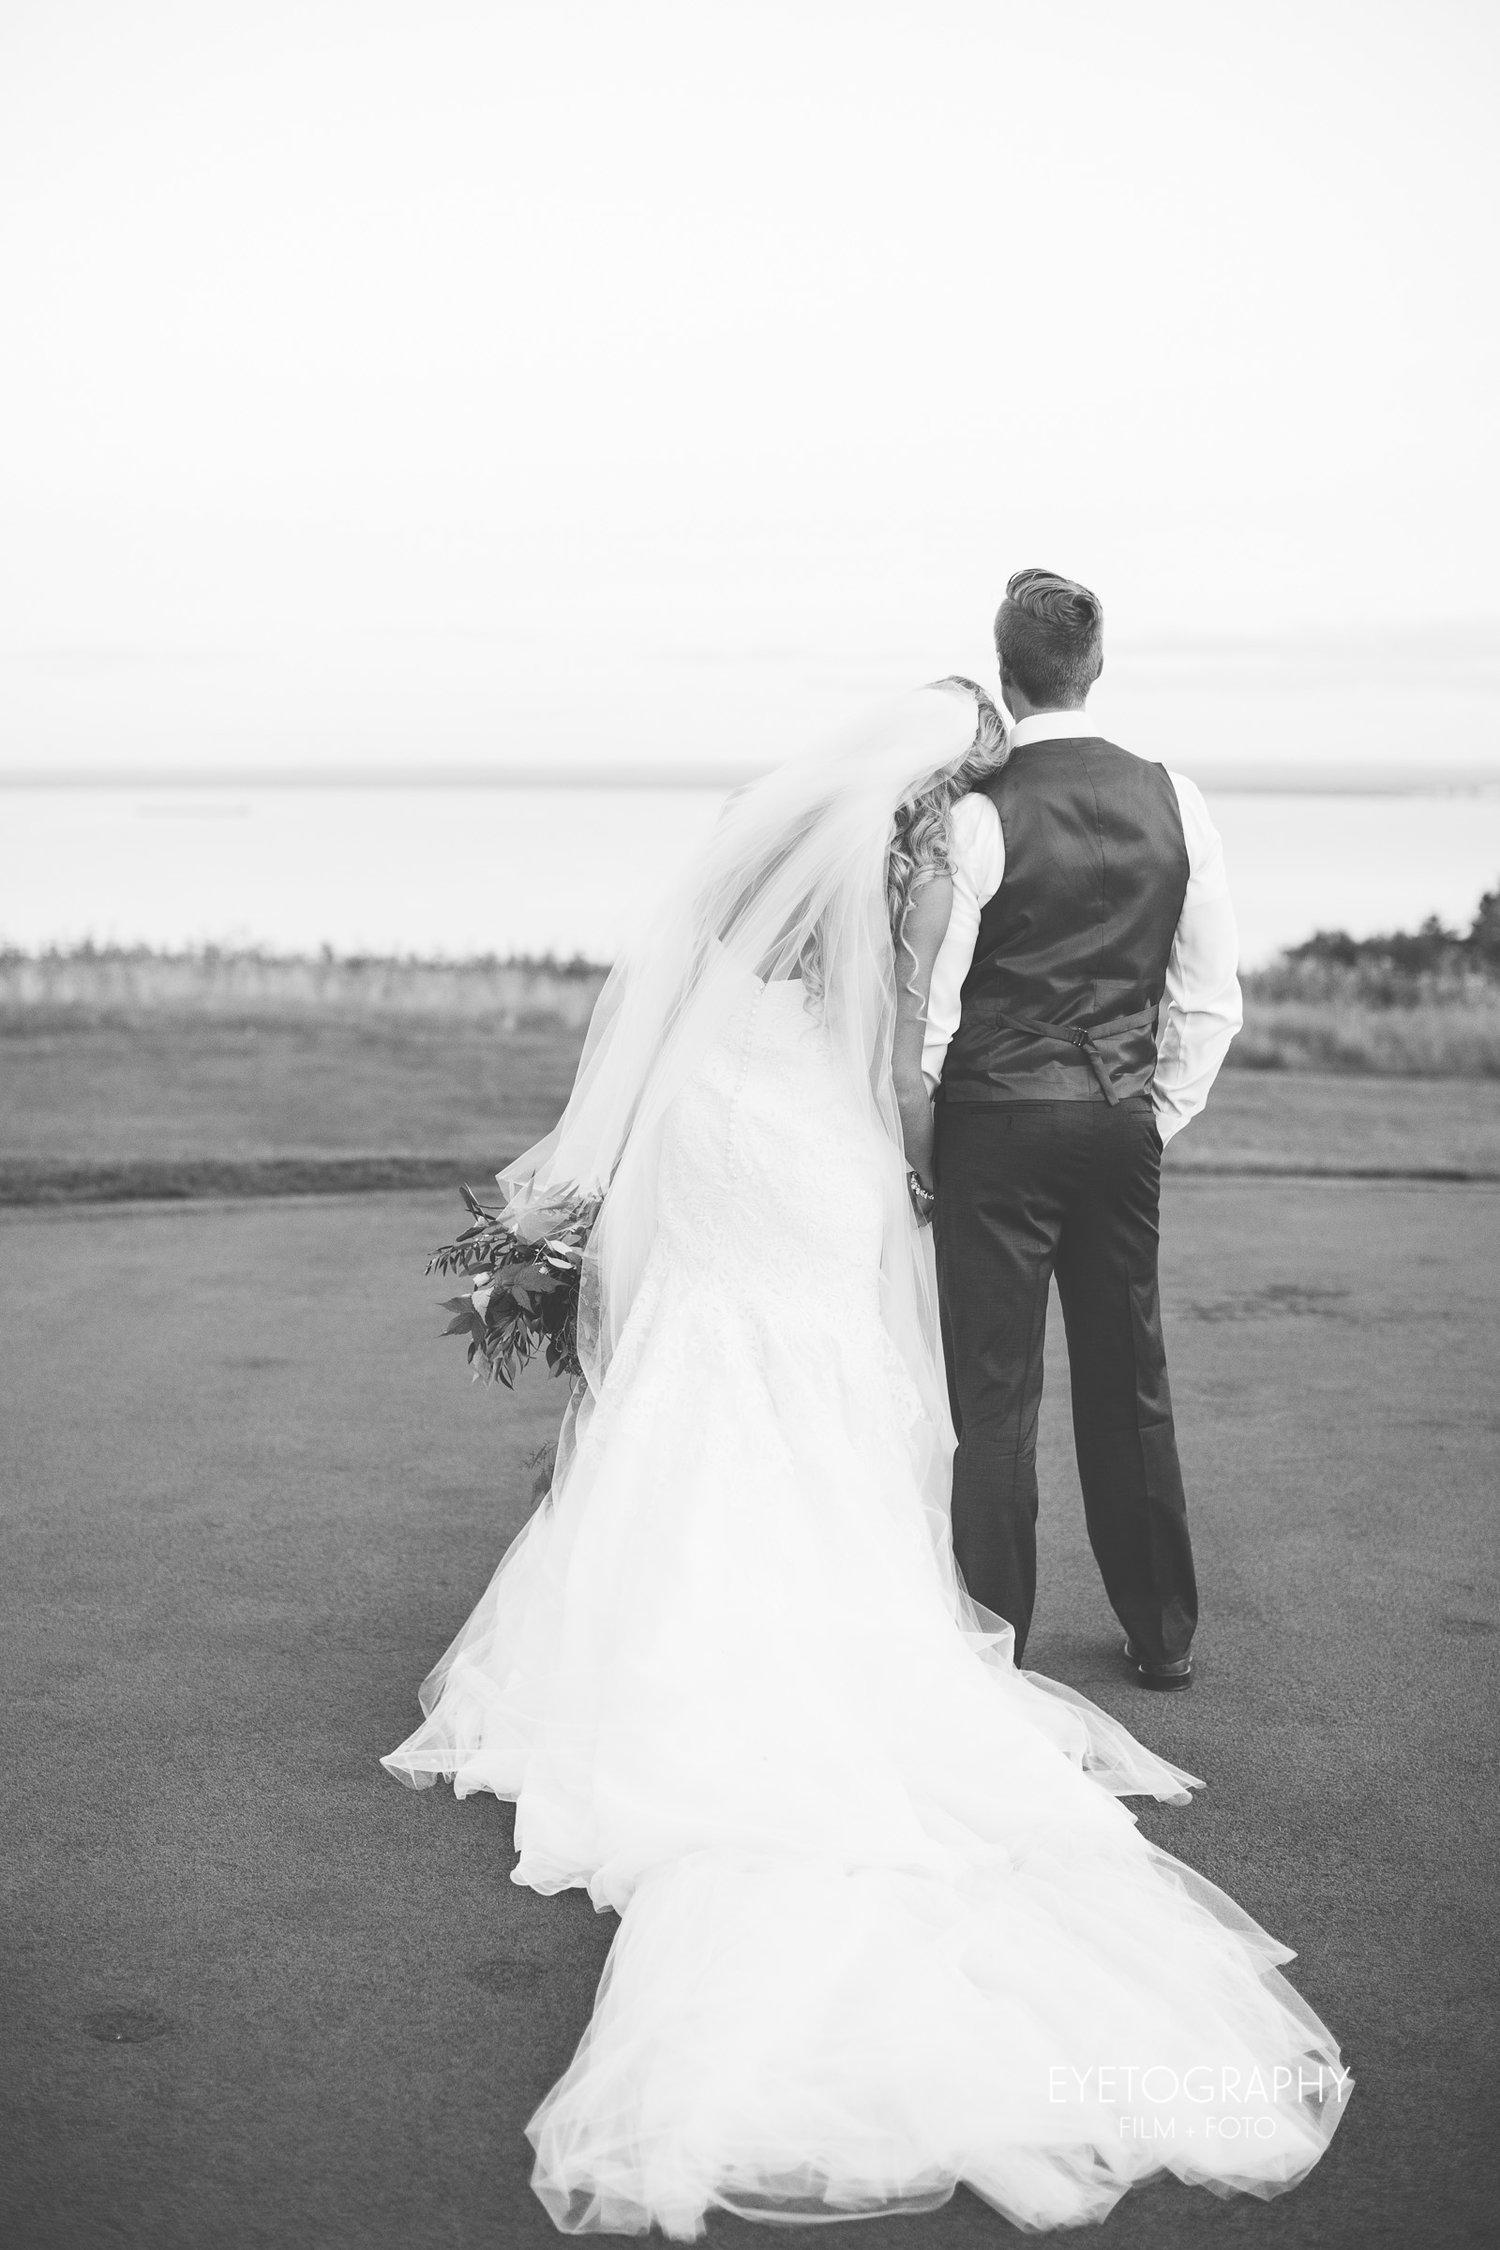 Wedding Graphy Mn | About Us K M Rentals